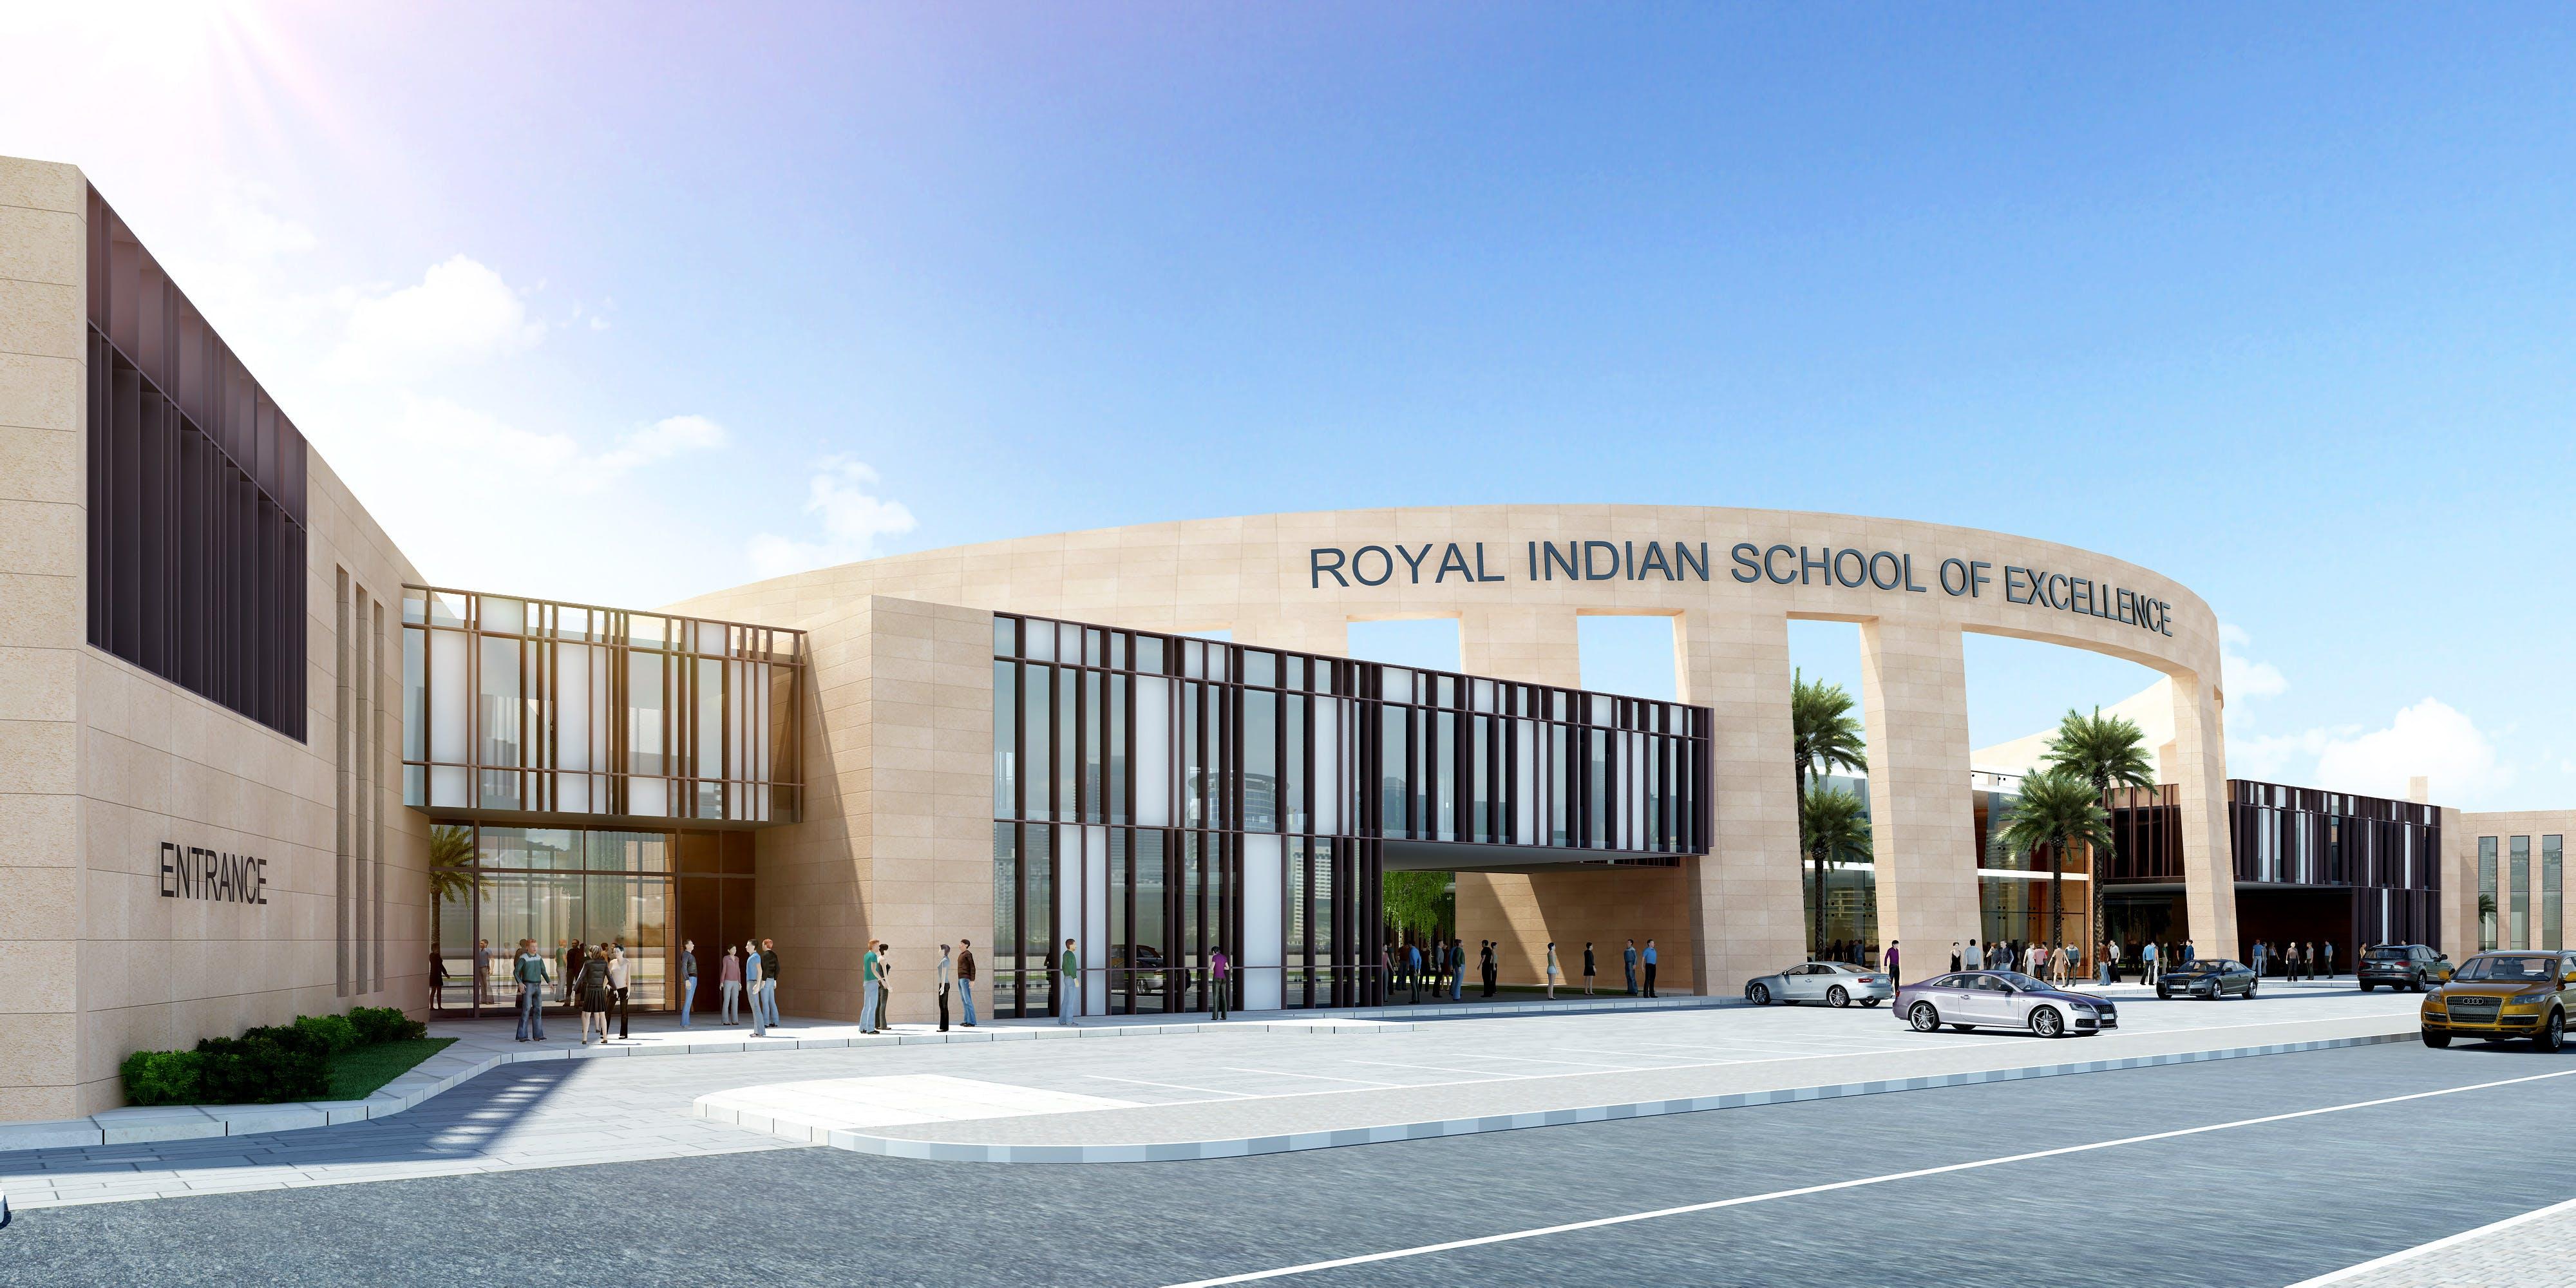 D Front Elevation Of School : Indian school uae shanad iqbal archinect